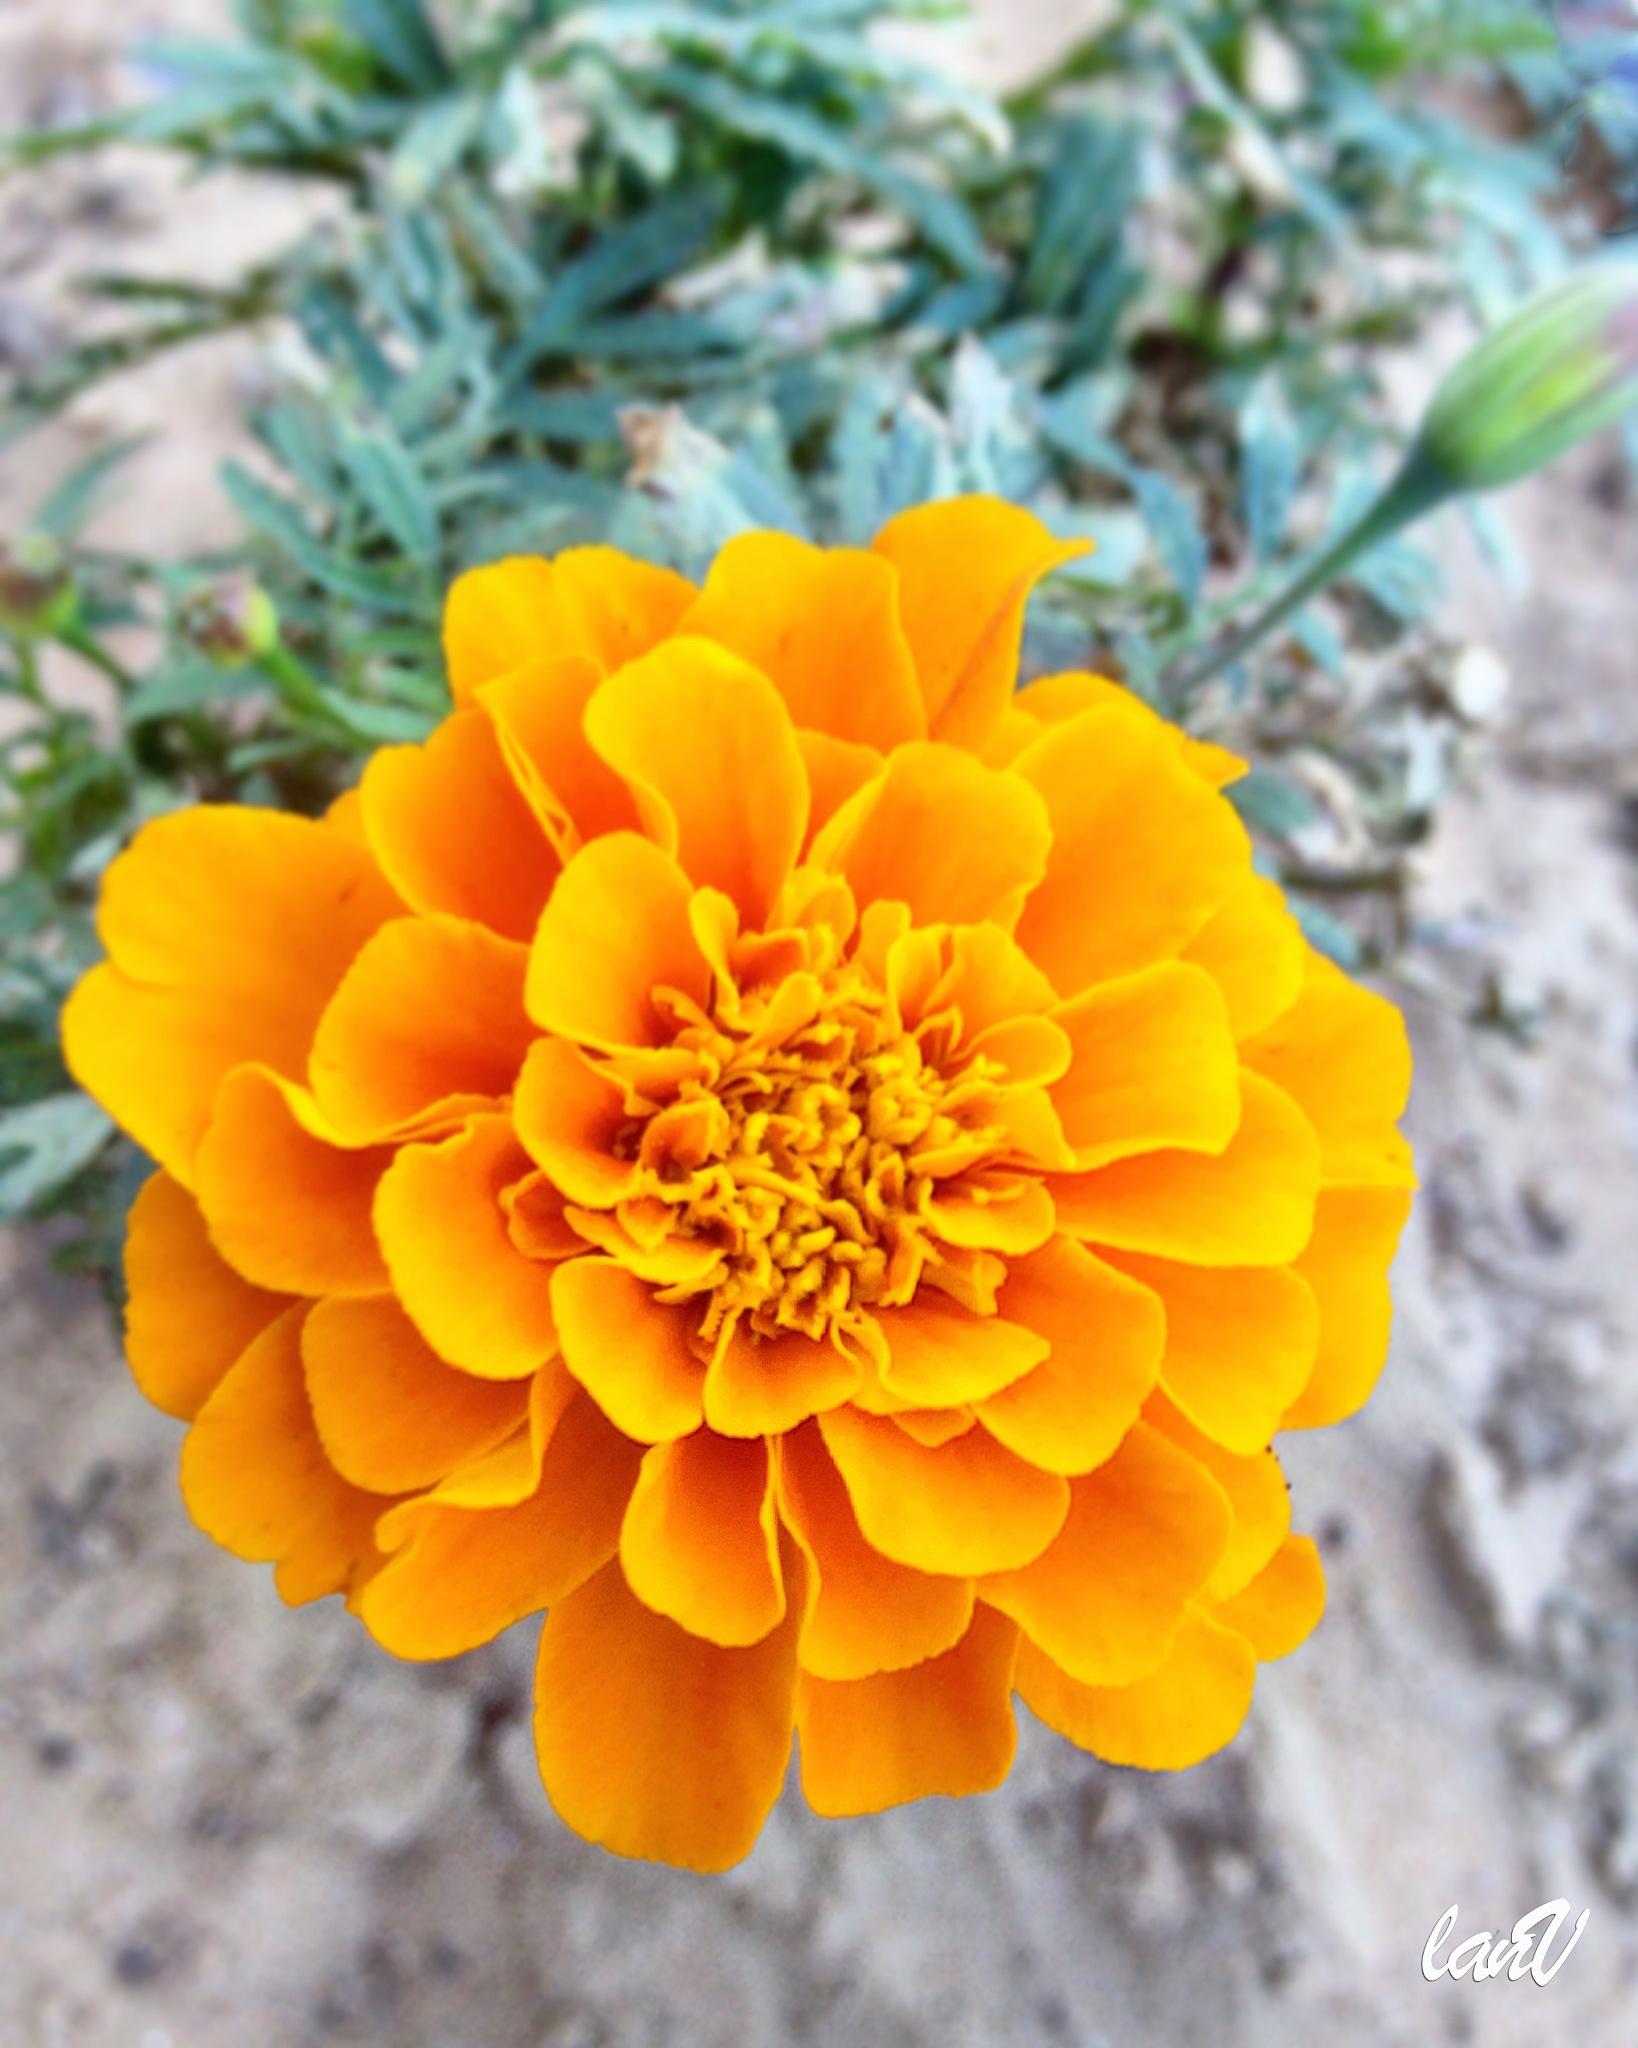 Chrysanthemum in the desert by imsimplylani